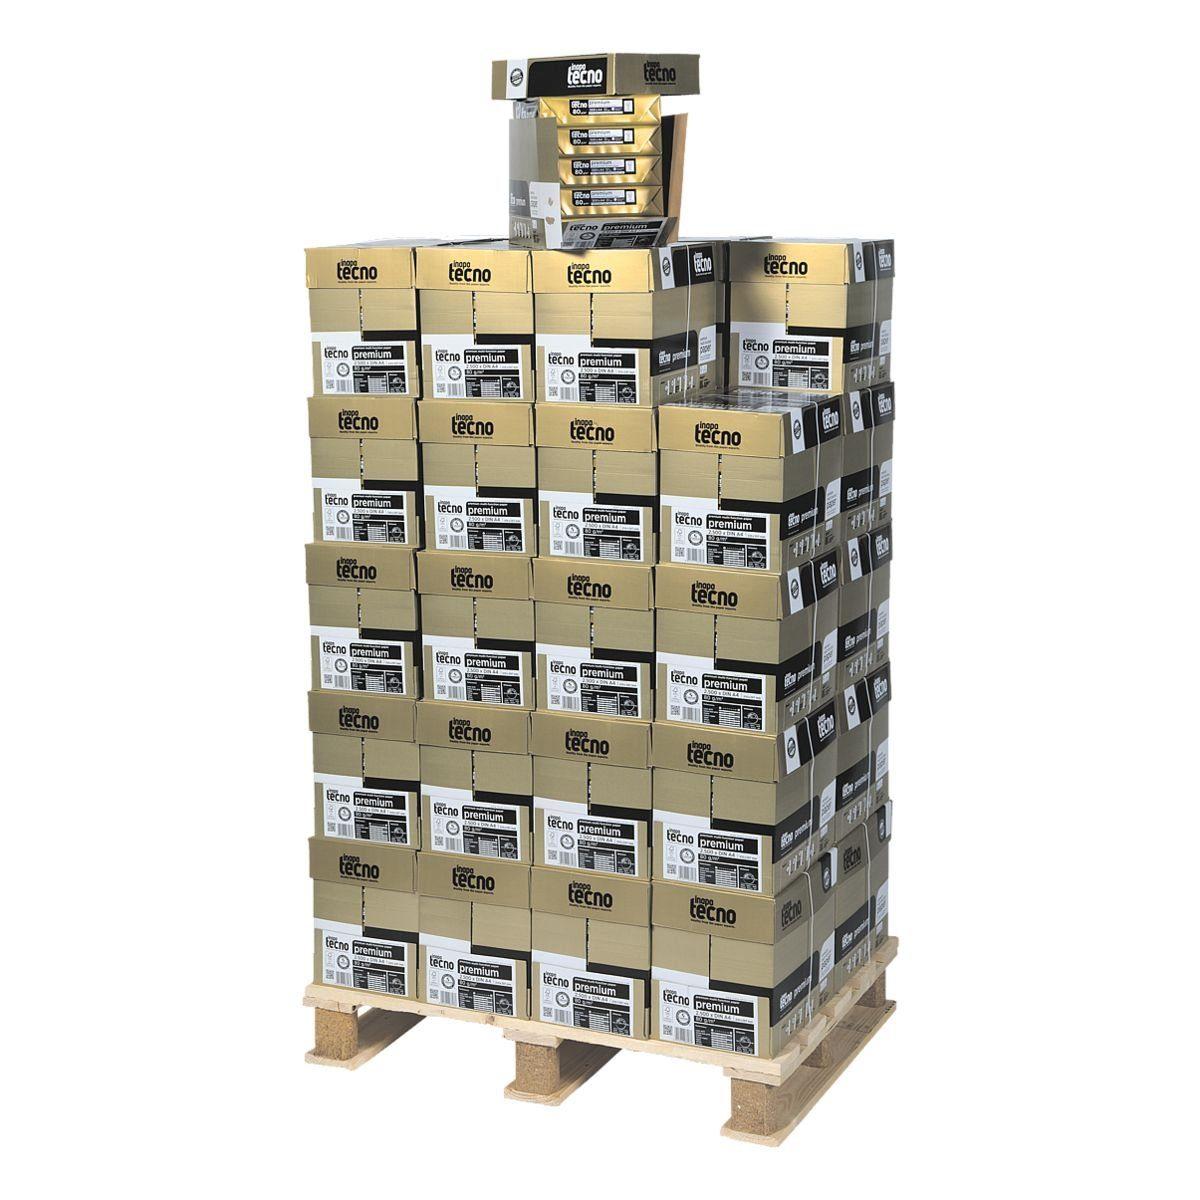 Inapa tecno 1/2 Palette Multifunktionales Druckerpapier »Premium«